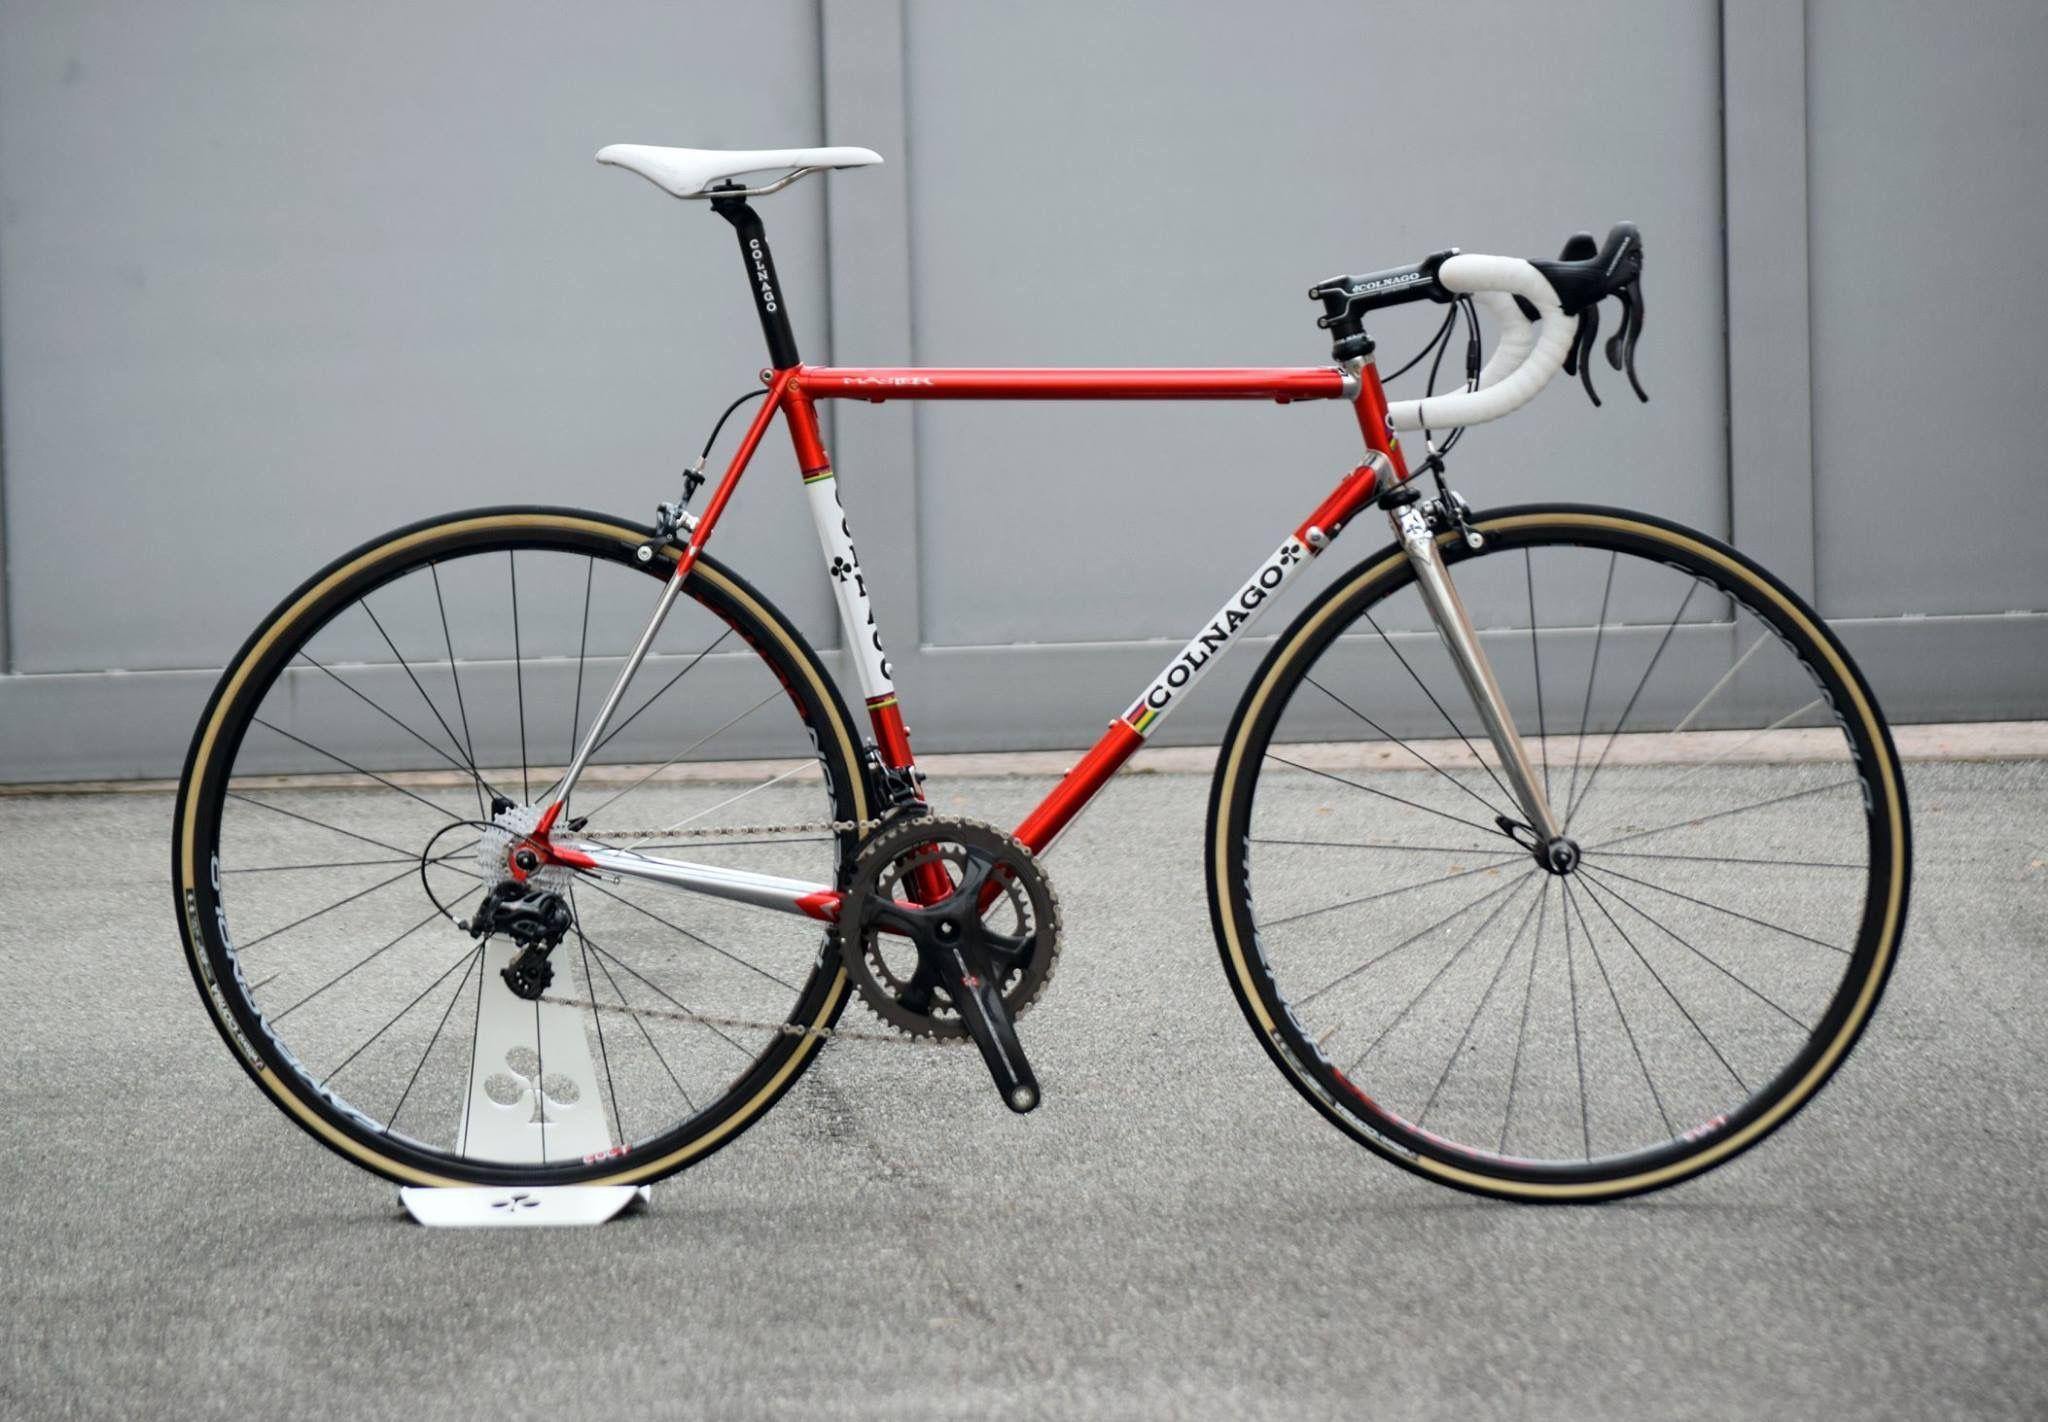 Colnago Master Bicicletas Clasicas Bici Bicicletas